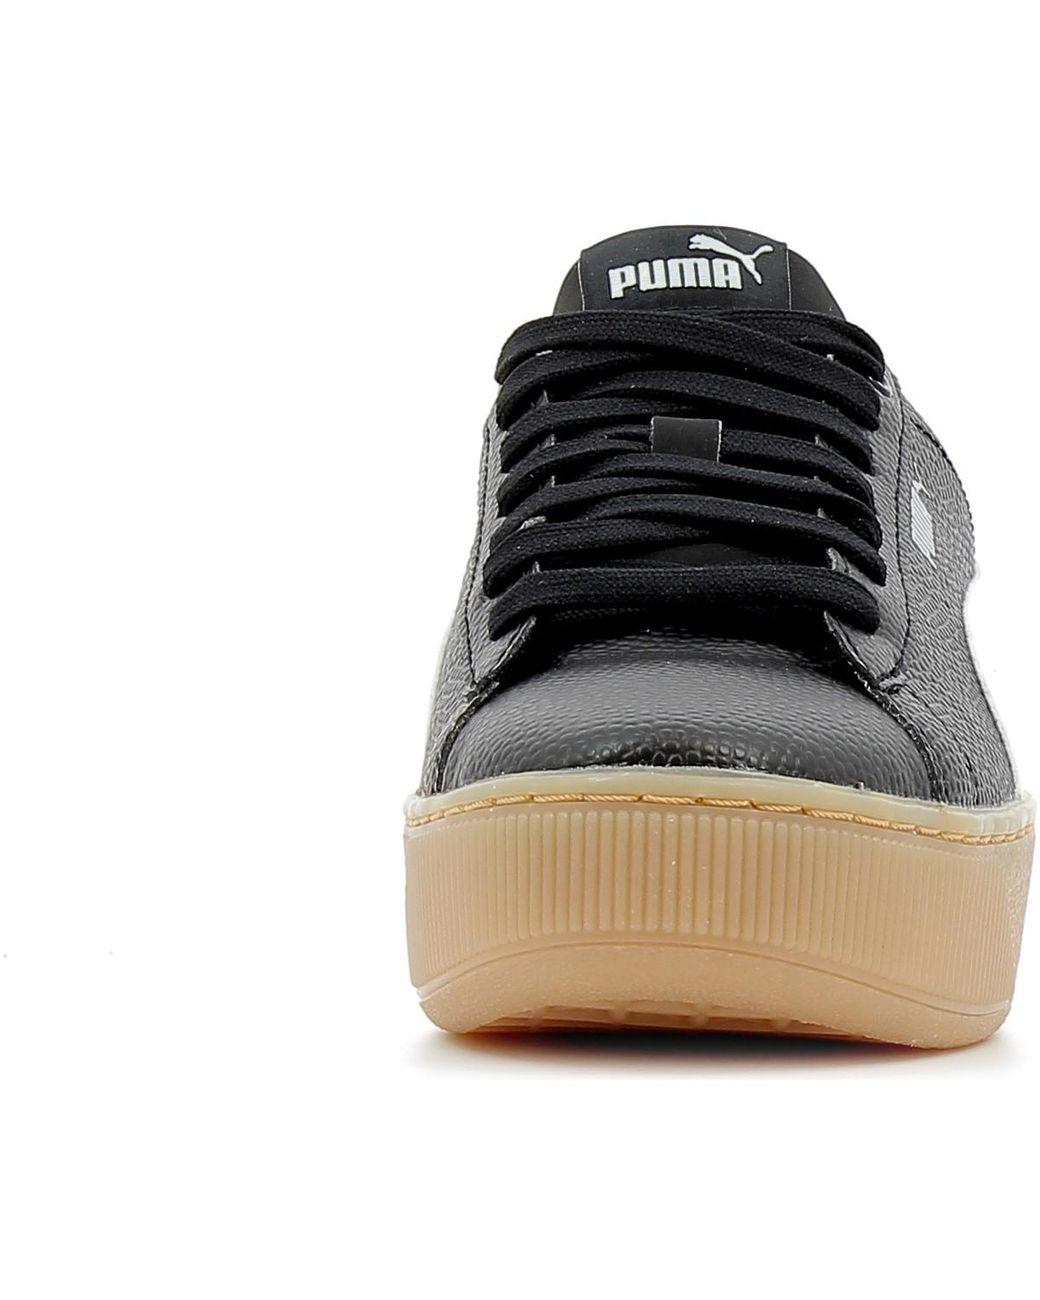 PUMA Lage Sneakers Vikky Platform Bsq in het Zwart Lyst